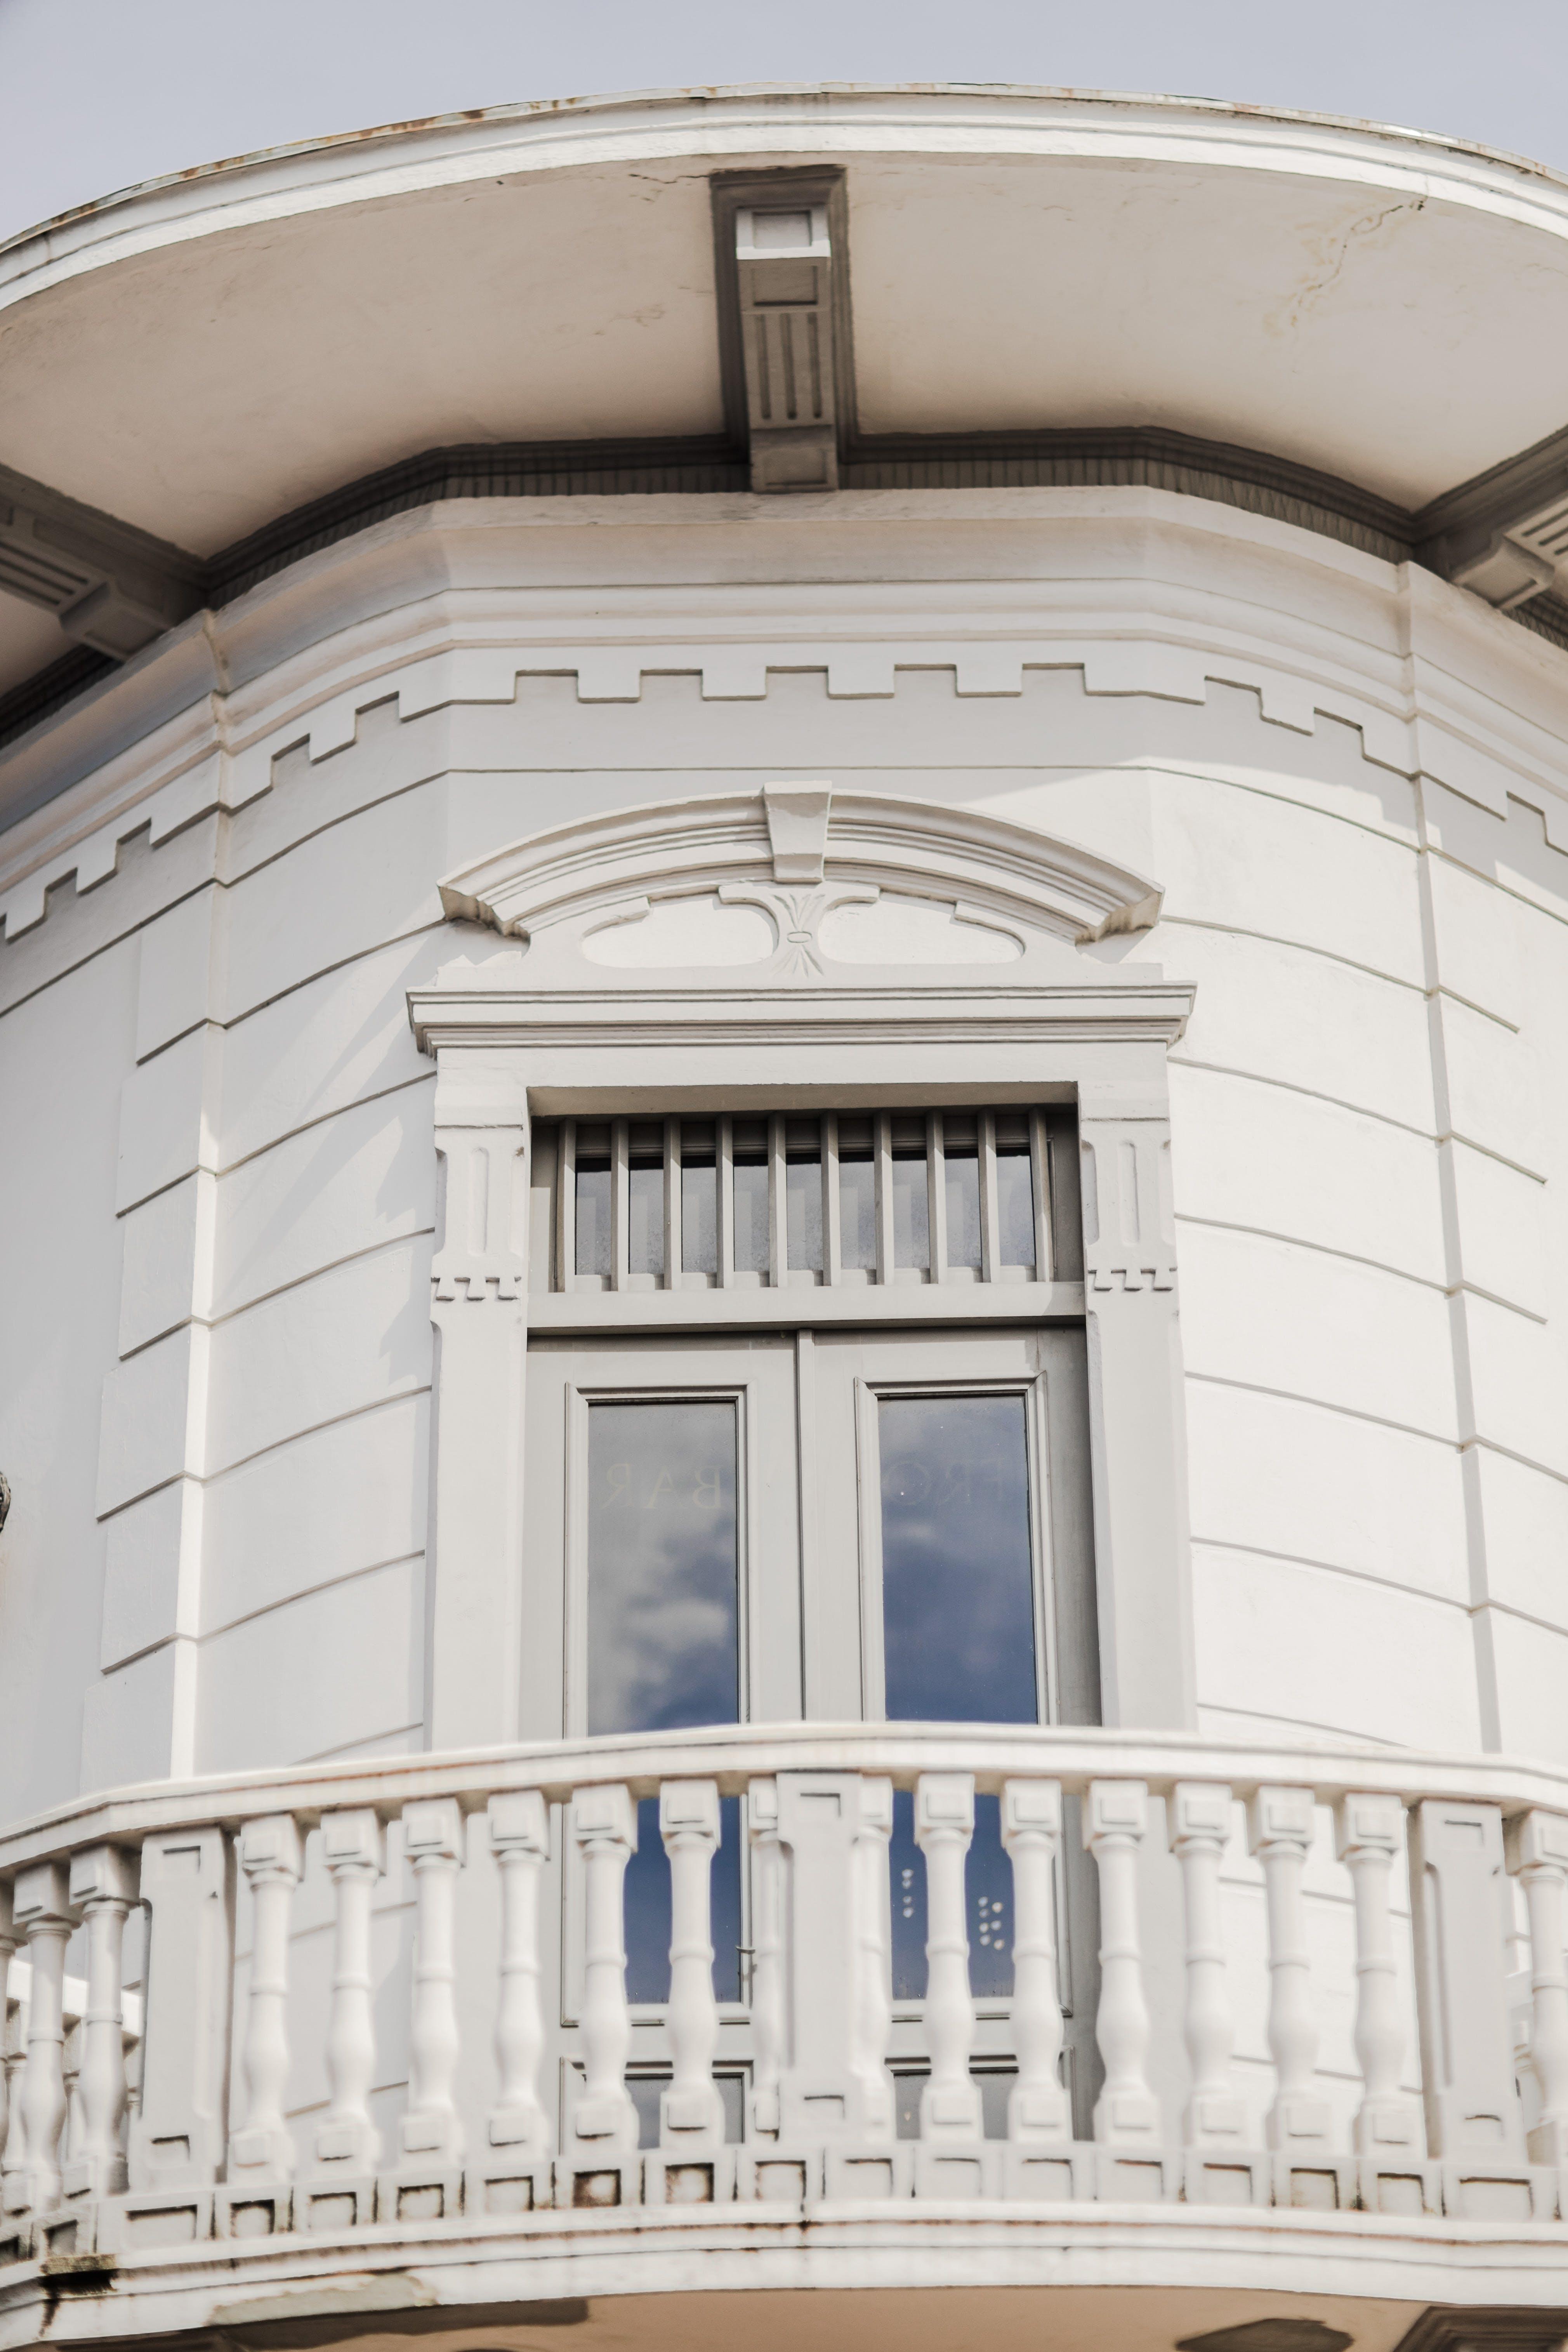 Foto stok gratis bangunan, bertingkat tinggi, dinding, jendela melengkung